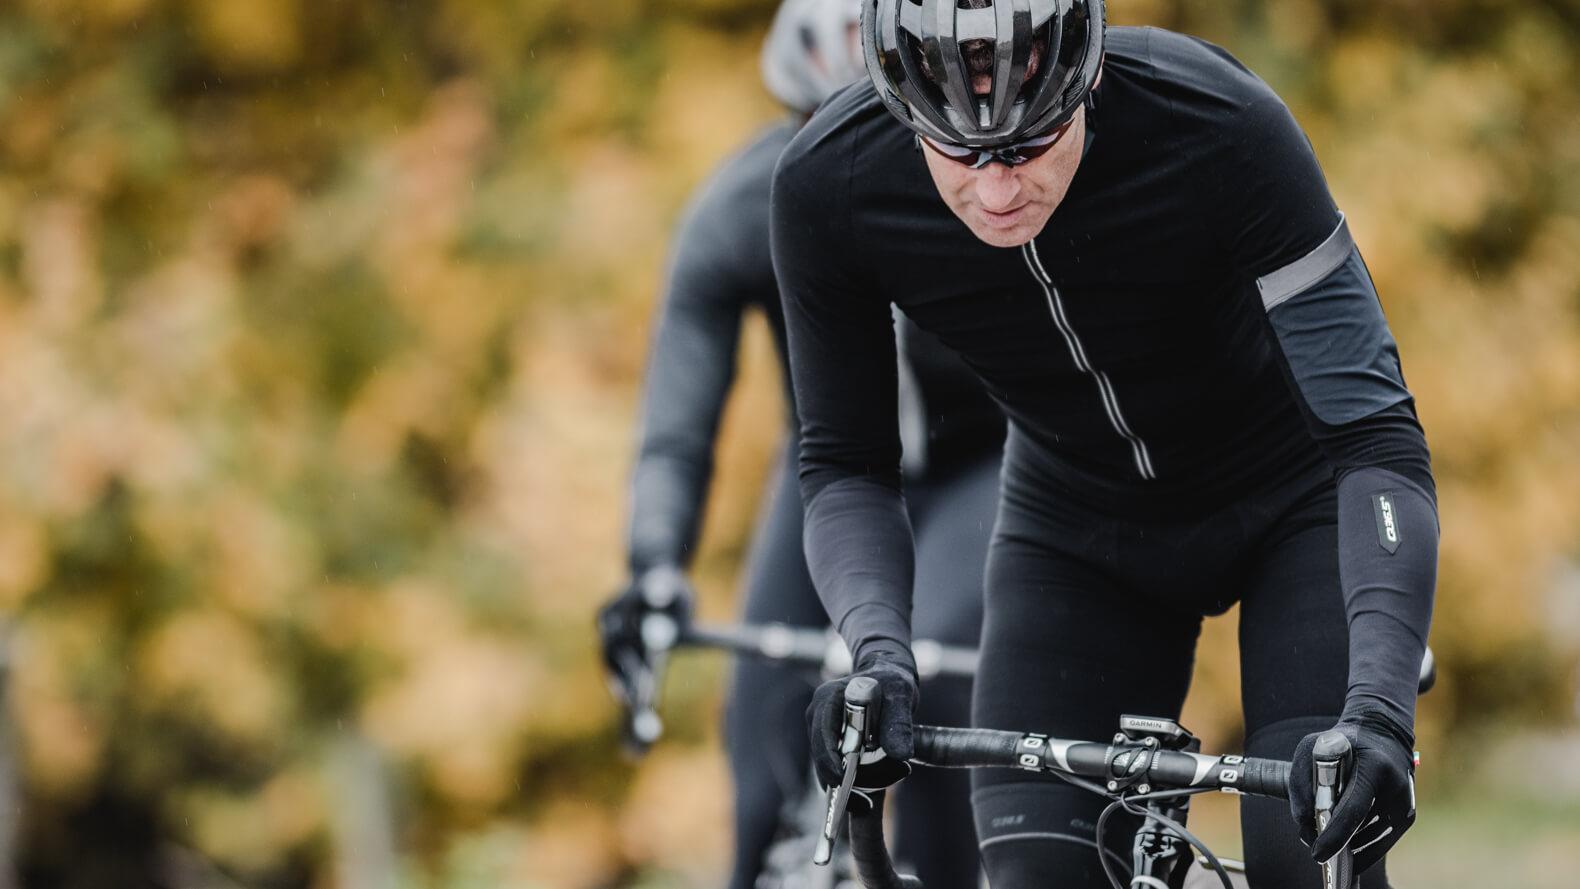 Details about  /1X Giacche da Ciclismo da Corsa per Bici da Ciclismo Giacche da Ciclismo Ul N5G7